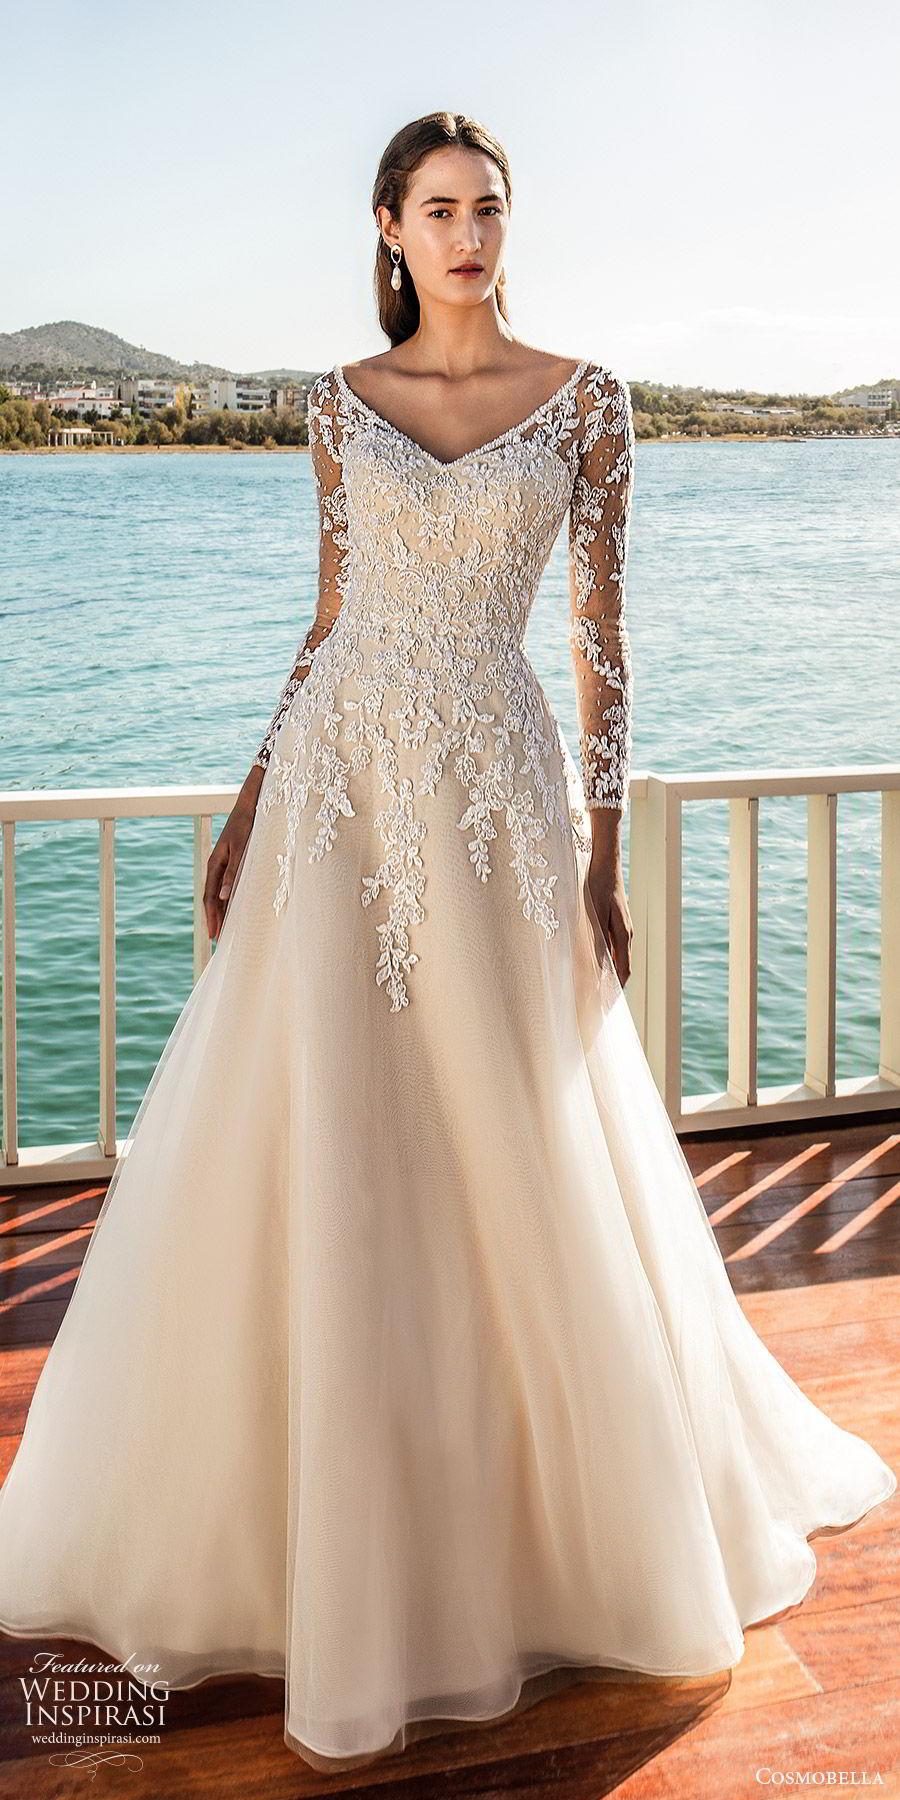 cosmobella 2020 bridal illusion long sleeves sweetheart embellished bodice a line ball gown wedding dress (21) elegant romantic princes chapel train mv